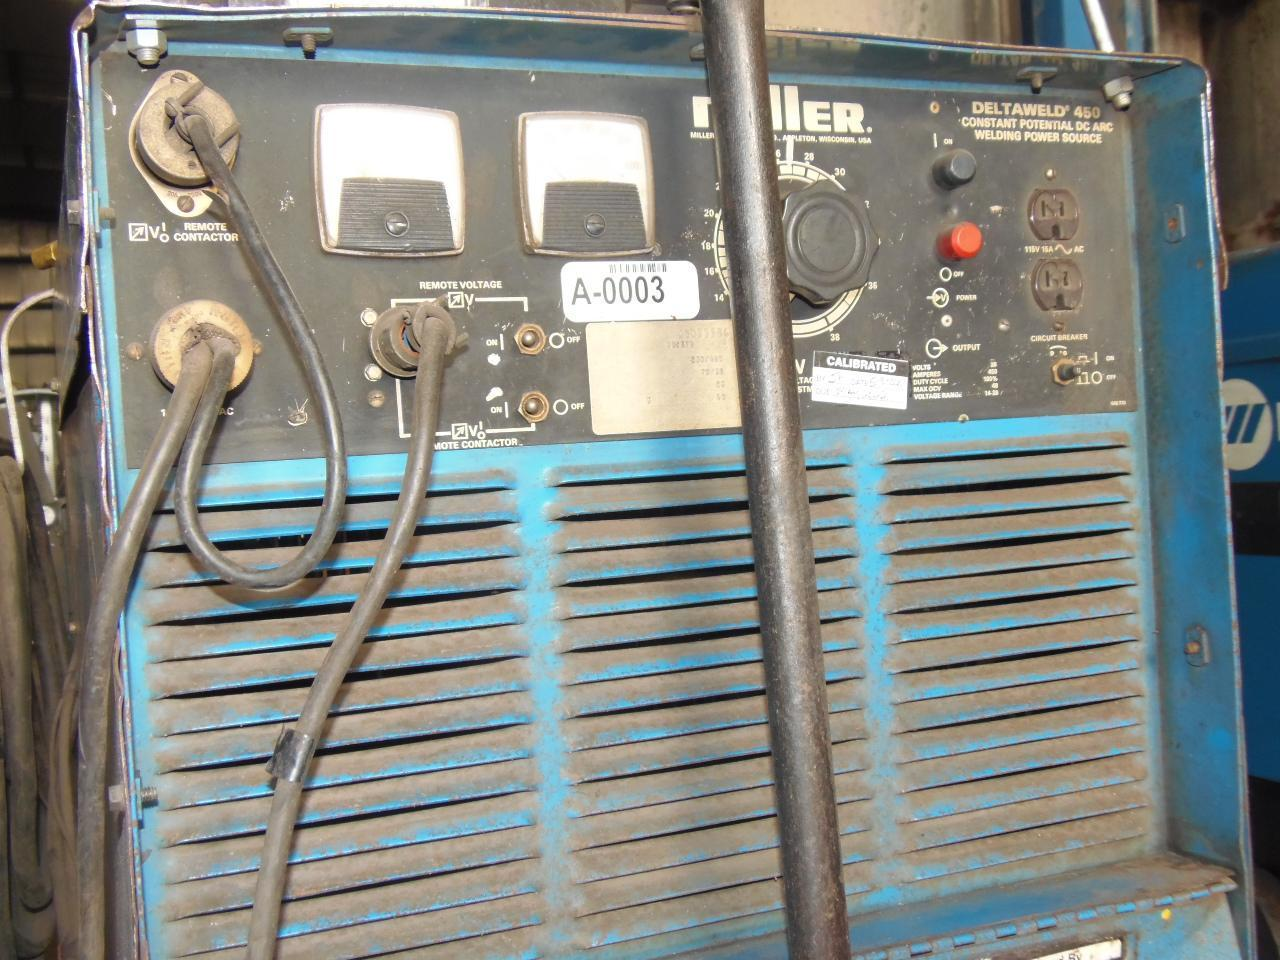 Miller 450 Amp Wire Feed Welder, Model Deltaweld 450 with D54D Wire feeder